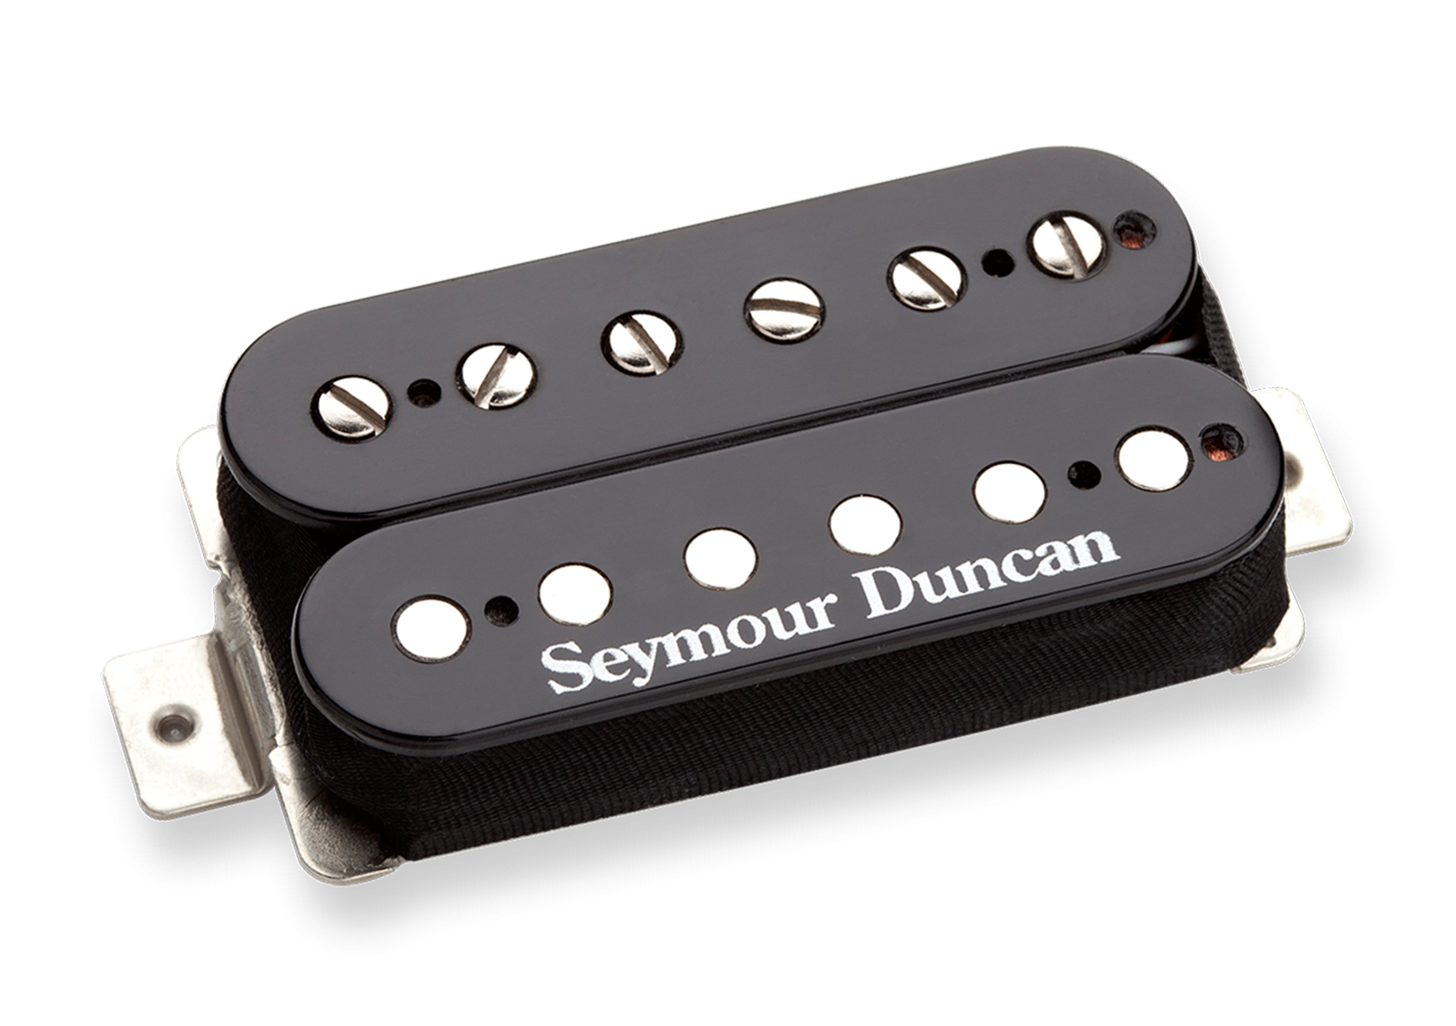 Seymour Duncan Whole Lotta Humbucker - SH-18N Neck Black